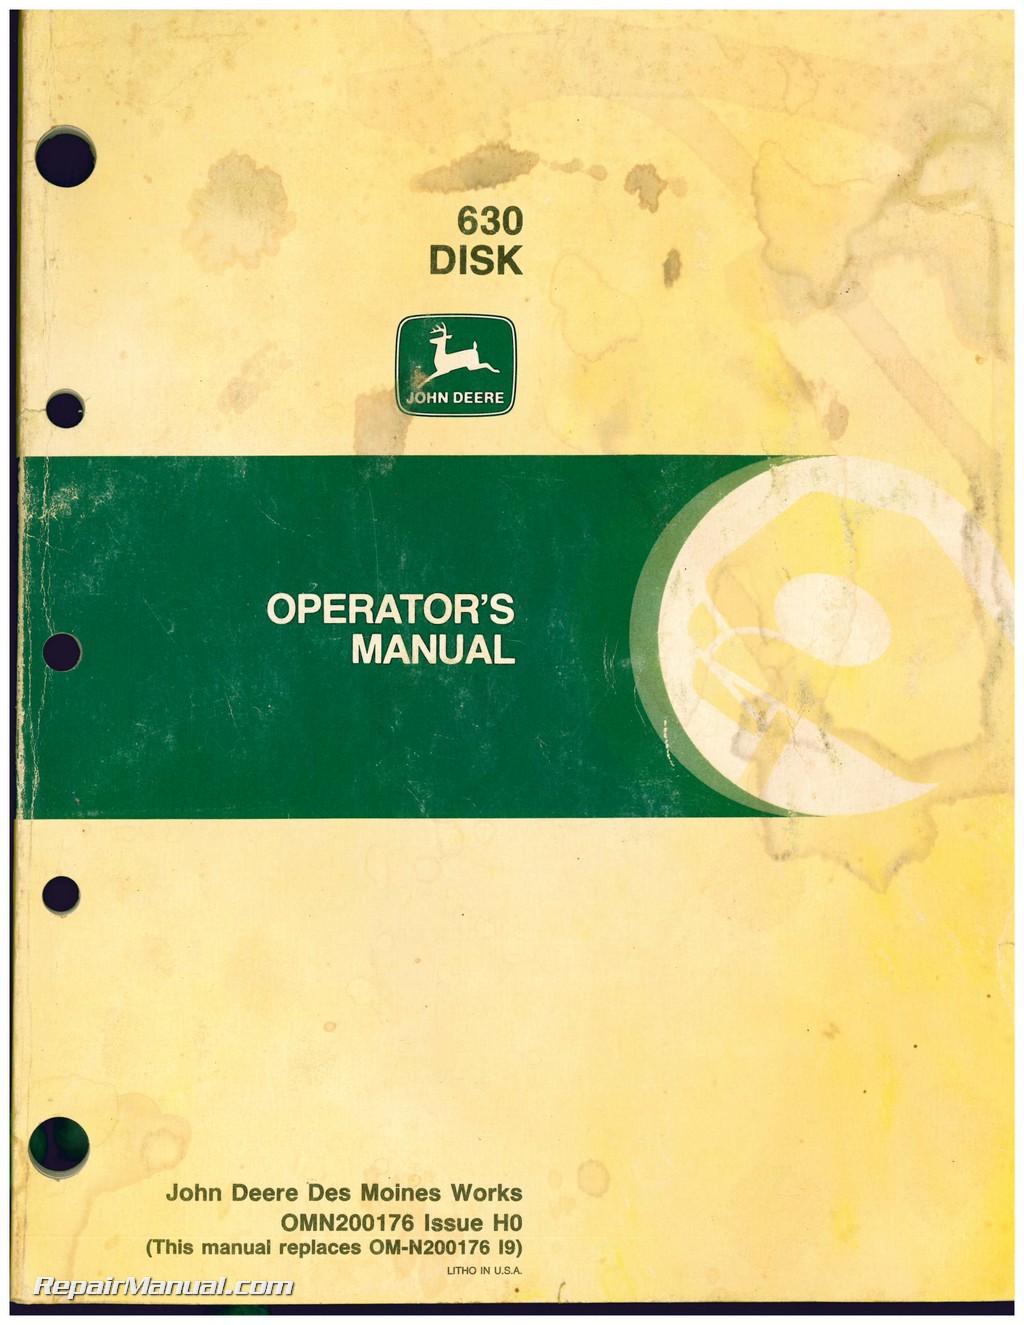 used john deere 630 disk operators manual rh repairmanual com John Deere Offset Harrow Old John Deere Harrows